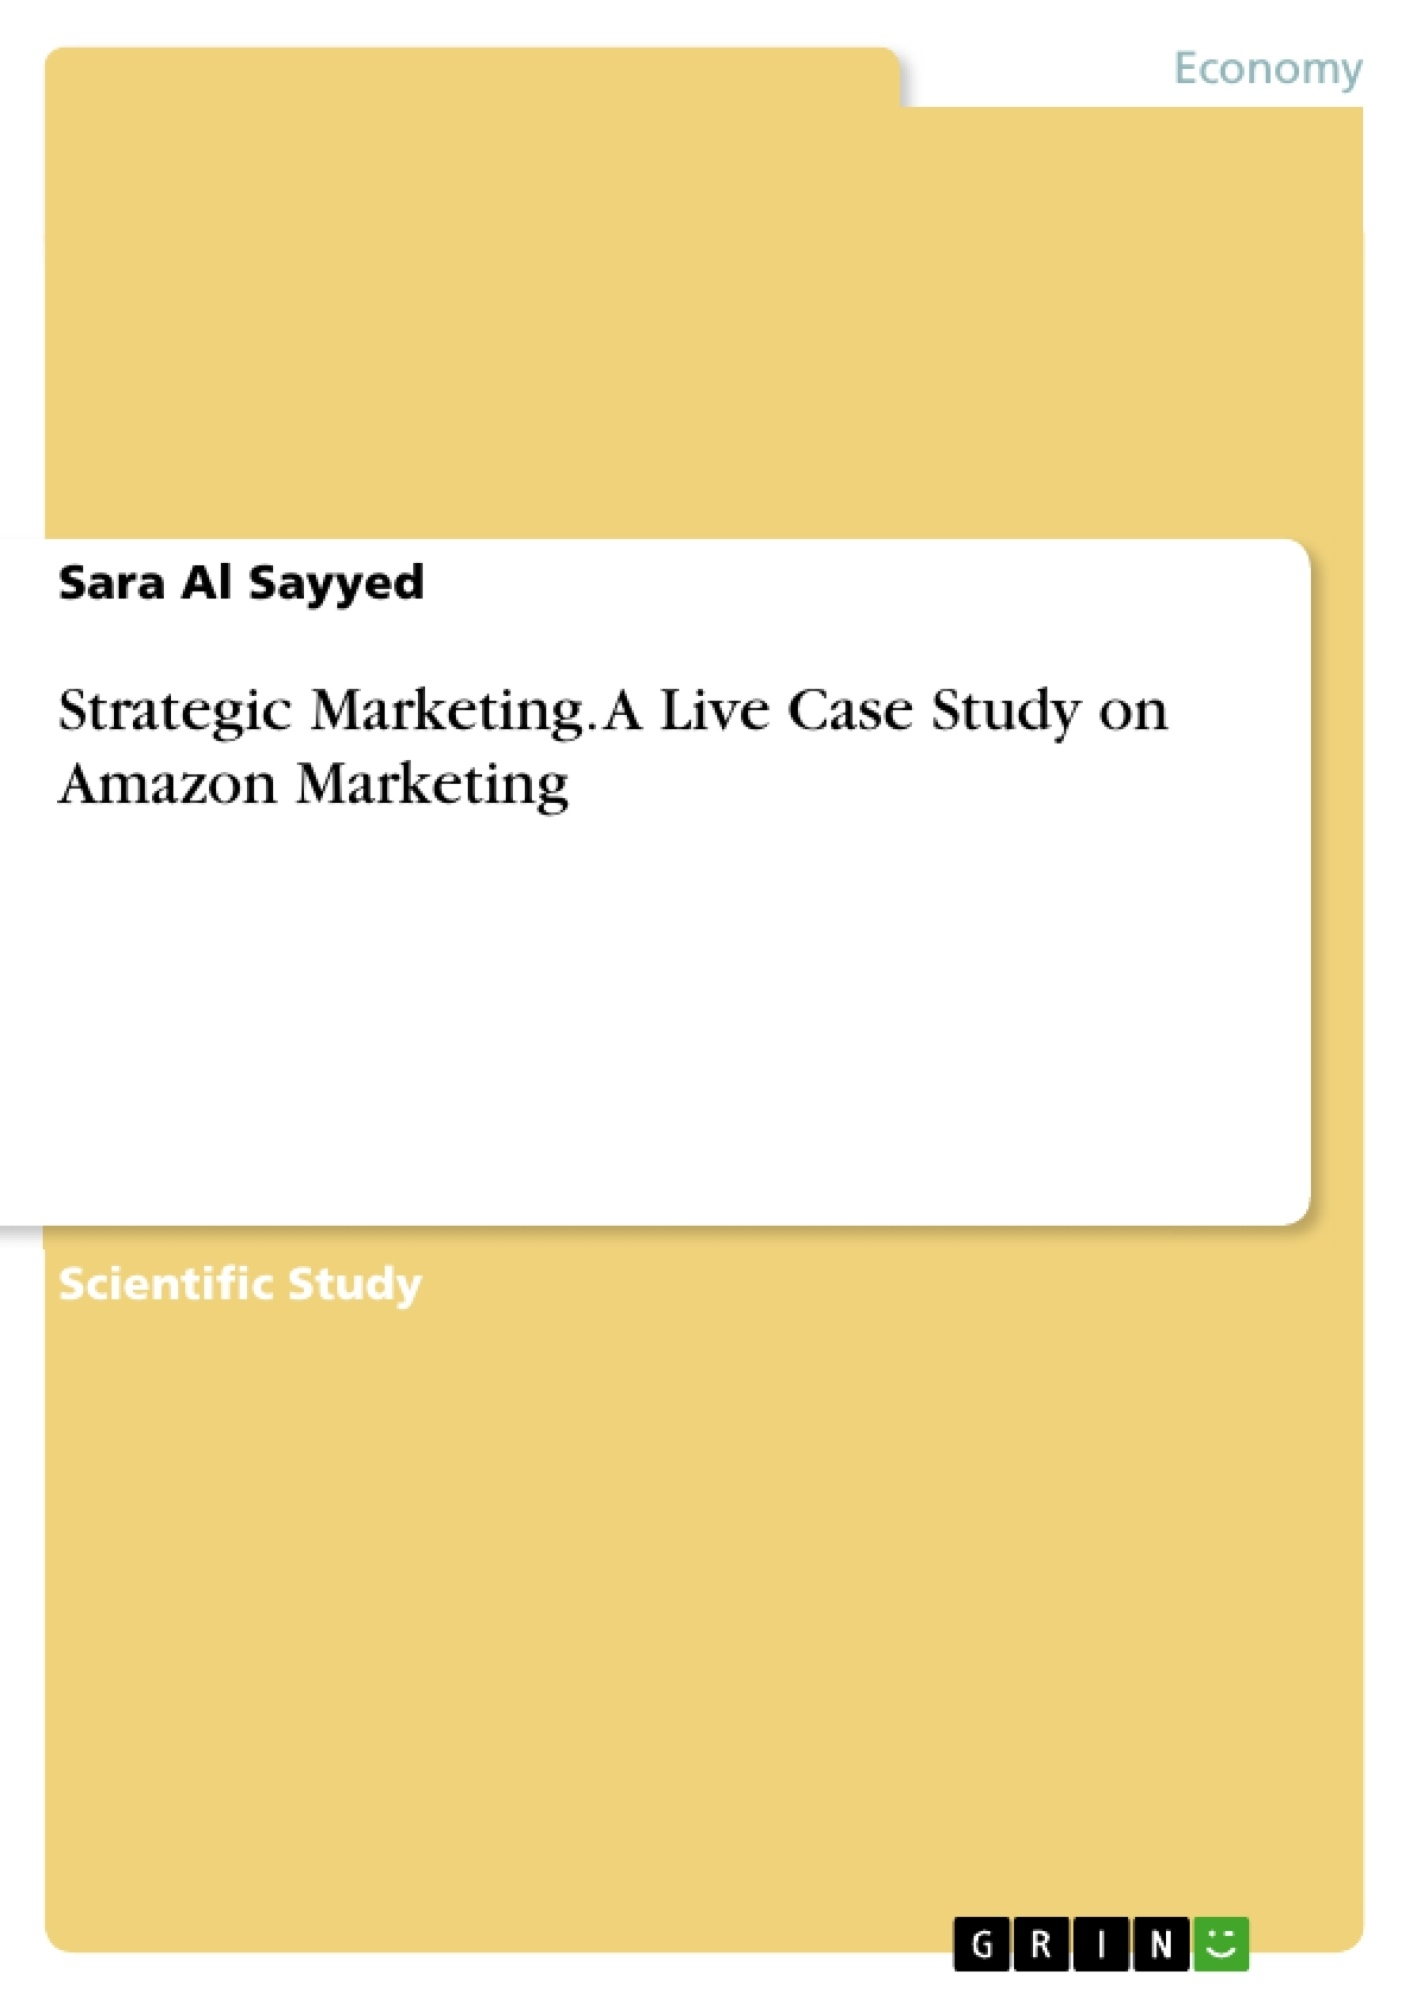 Title: Strategic Marketing. A Live Case Study on Amazon Marketing